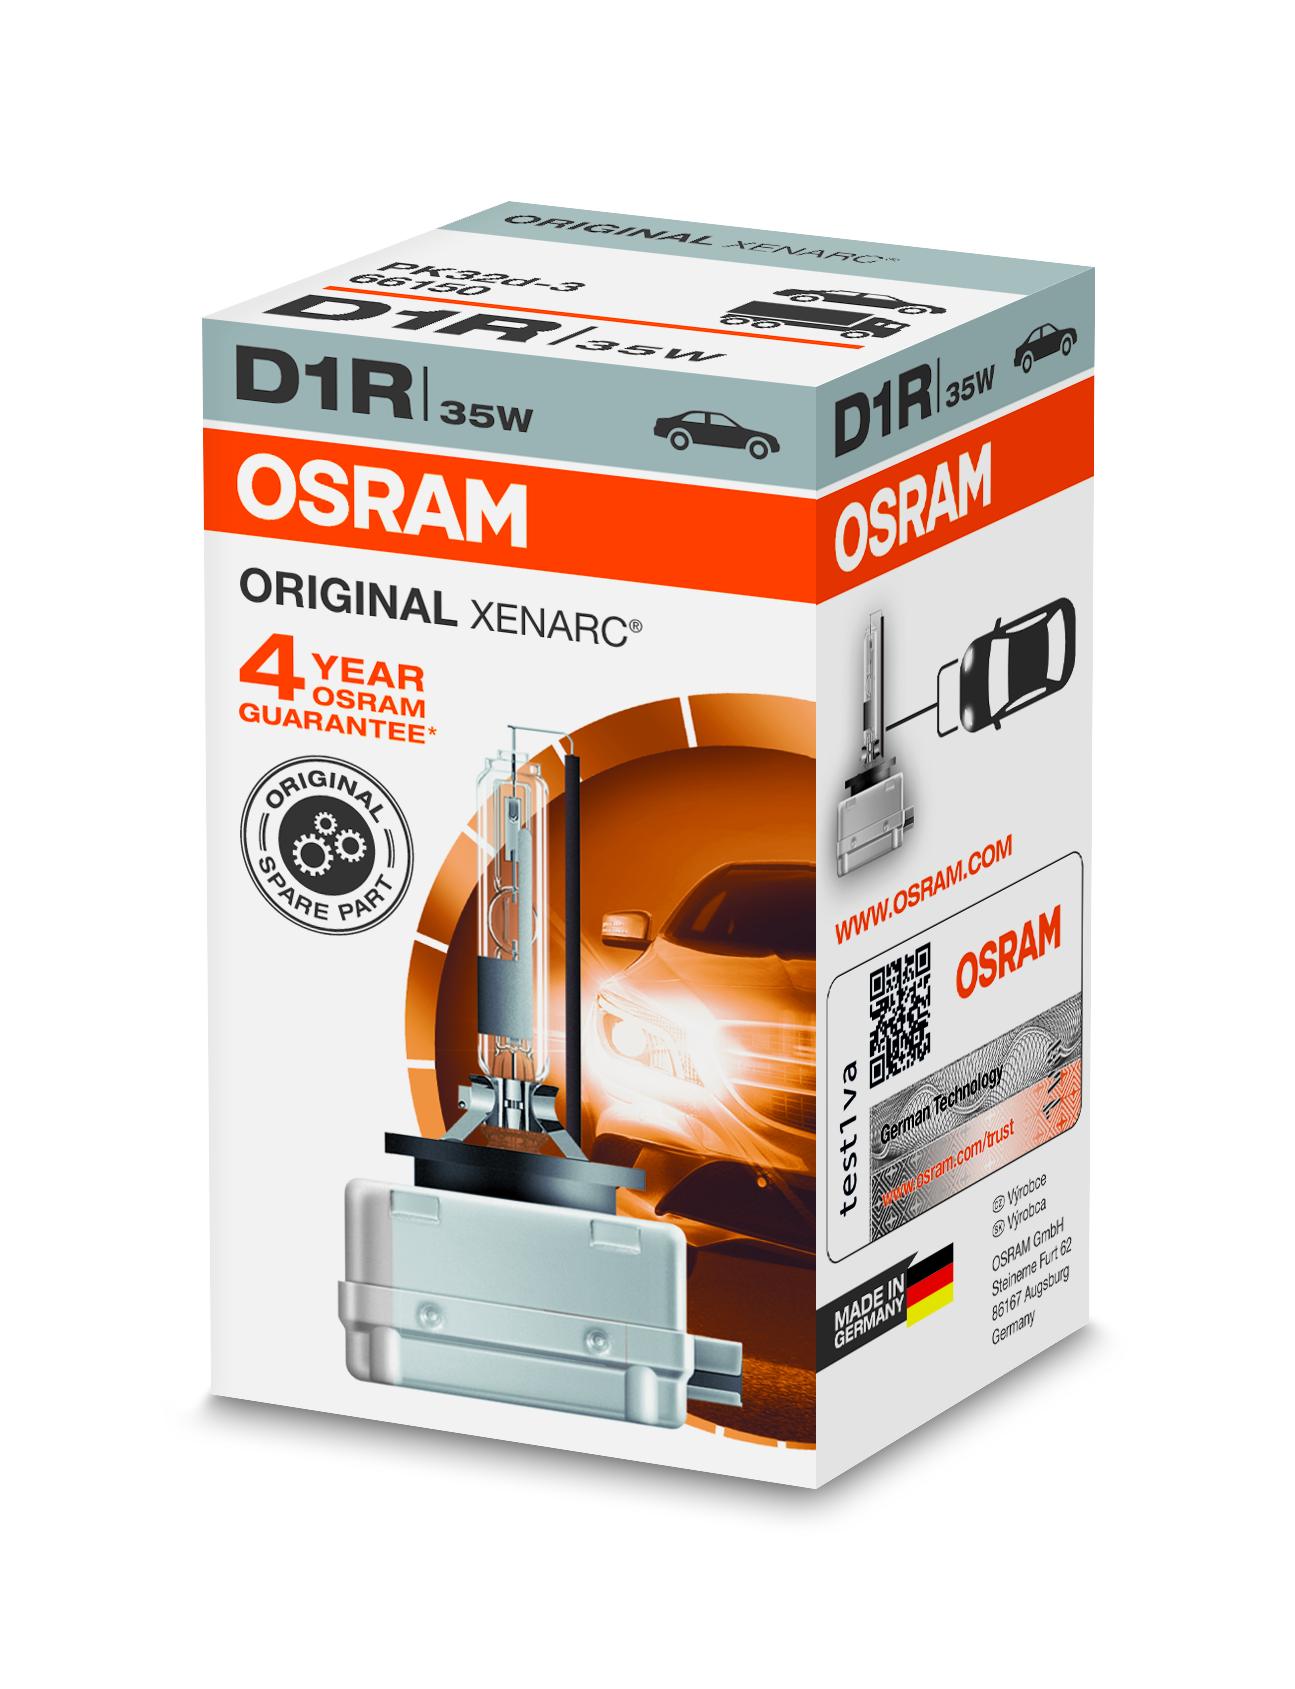 Osram Xenonová výbojka, XENARC, D1R, PK32d-3, 12/24V, 35W, 66150